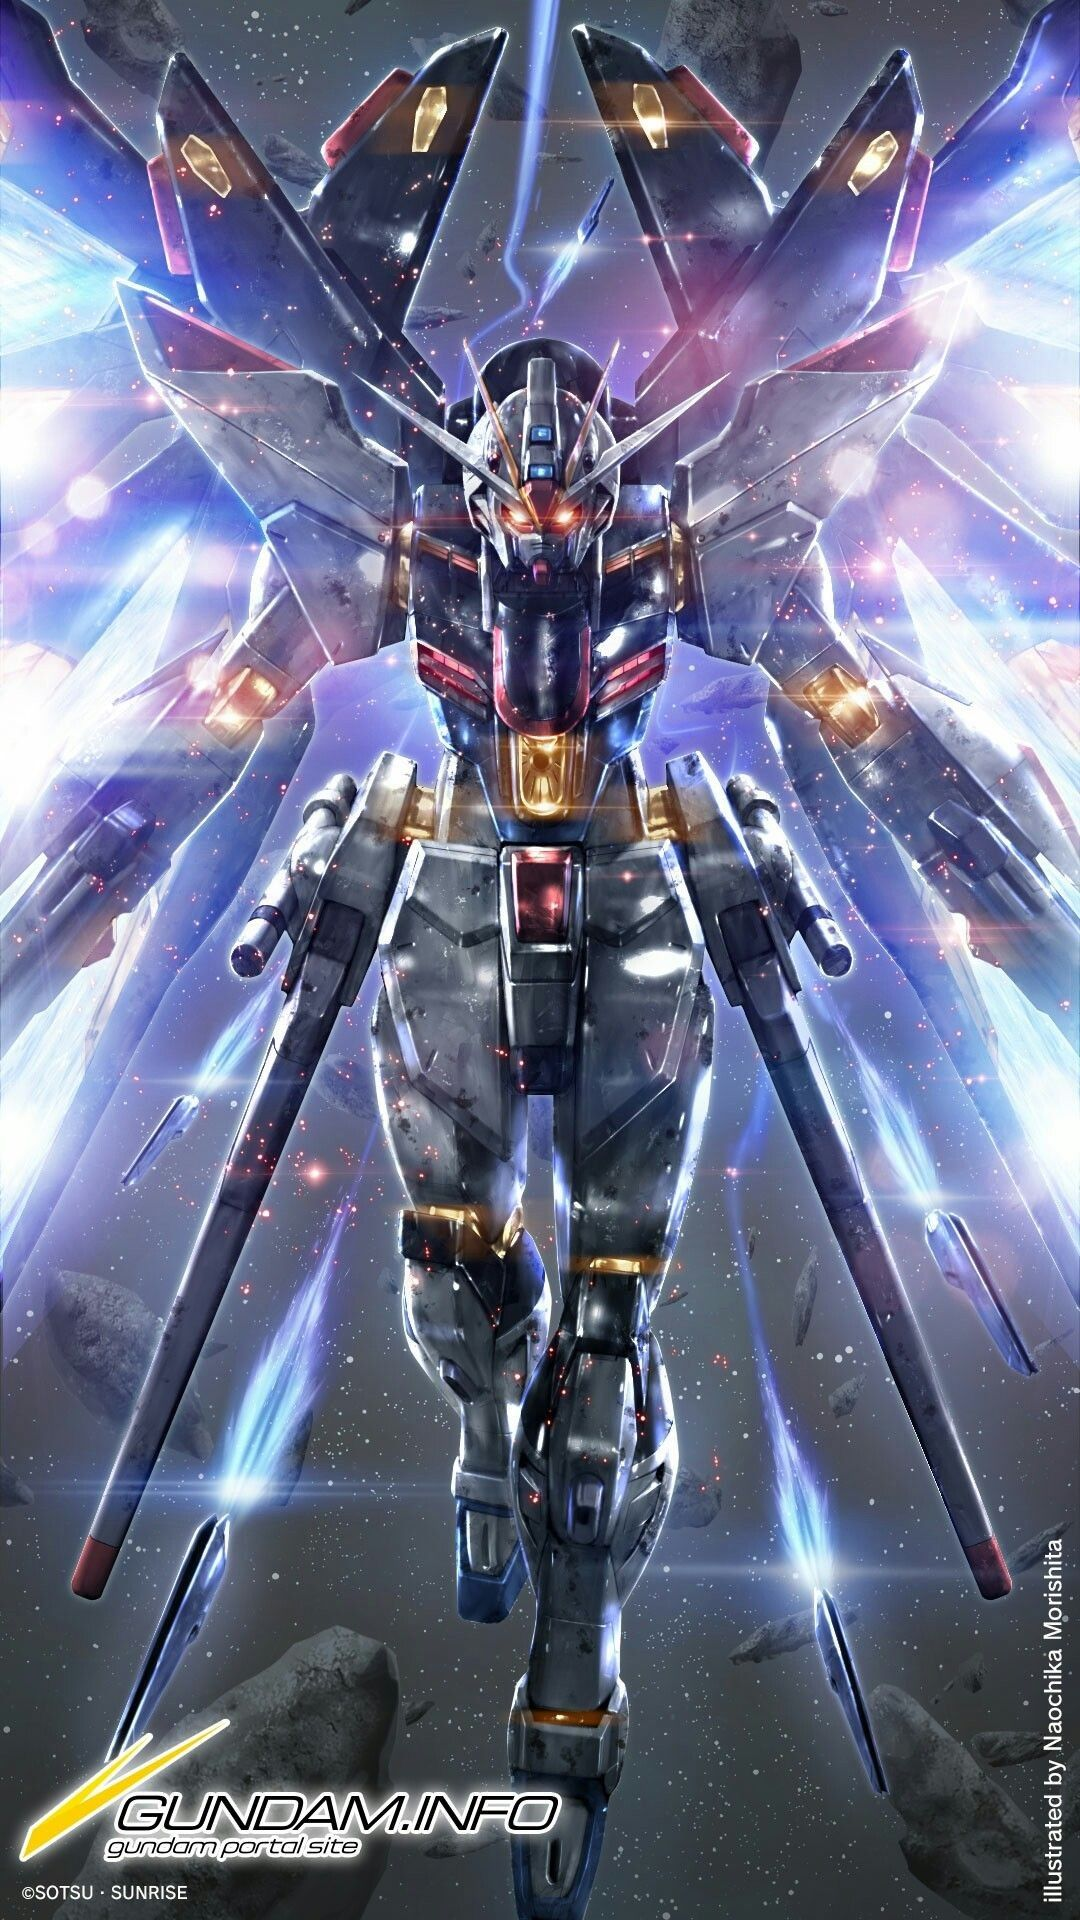 Gundam Strike Freedom Gundam Info Wallpaper Gundam Wallpapers Strike Gundam Gundam Art